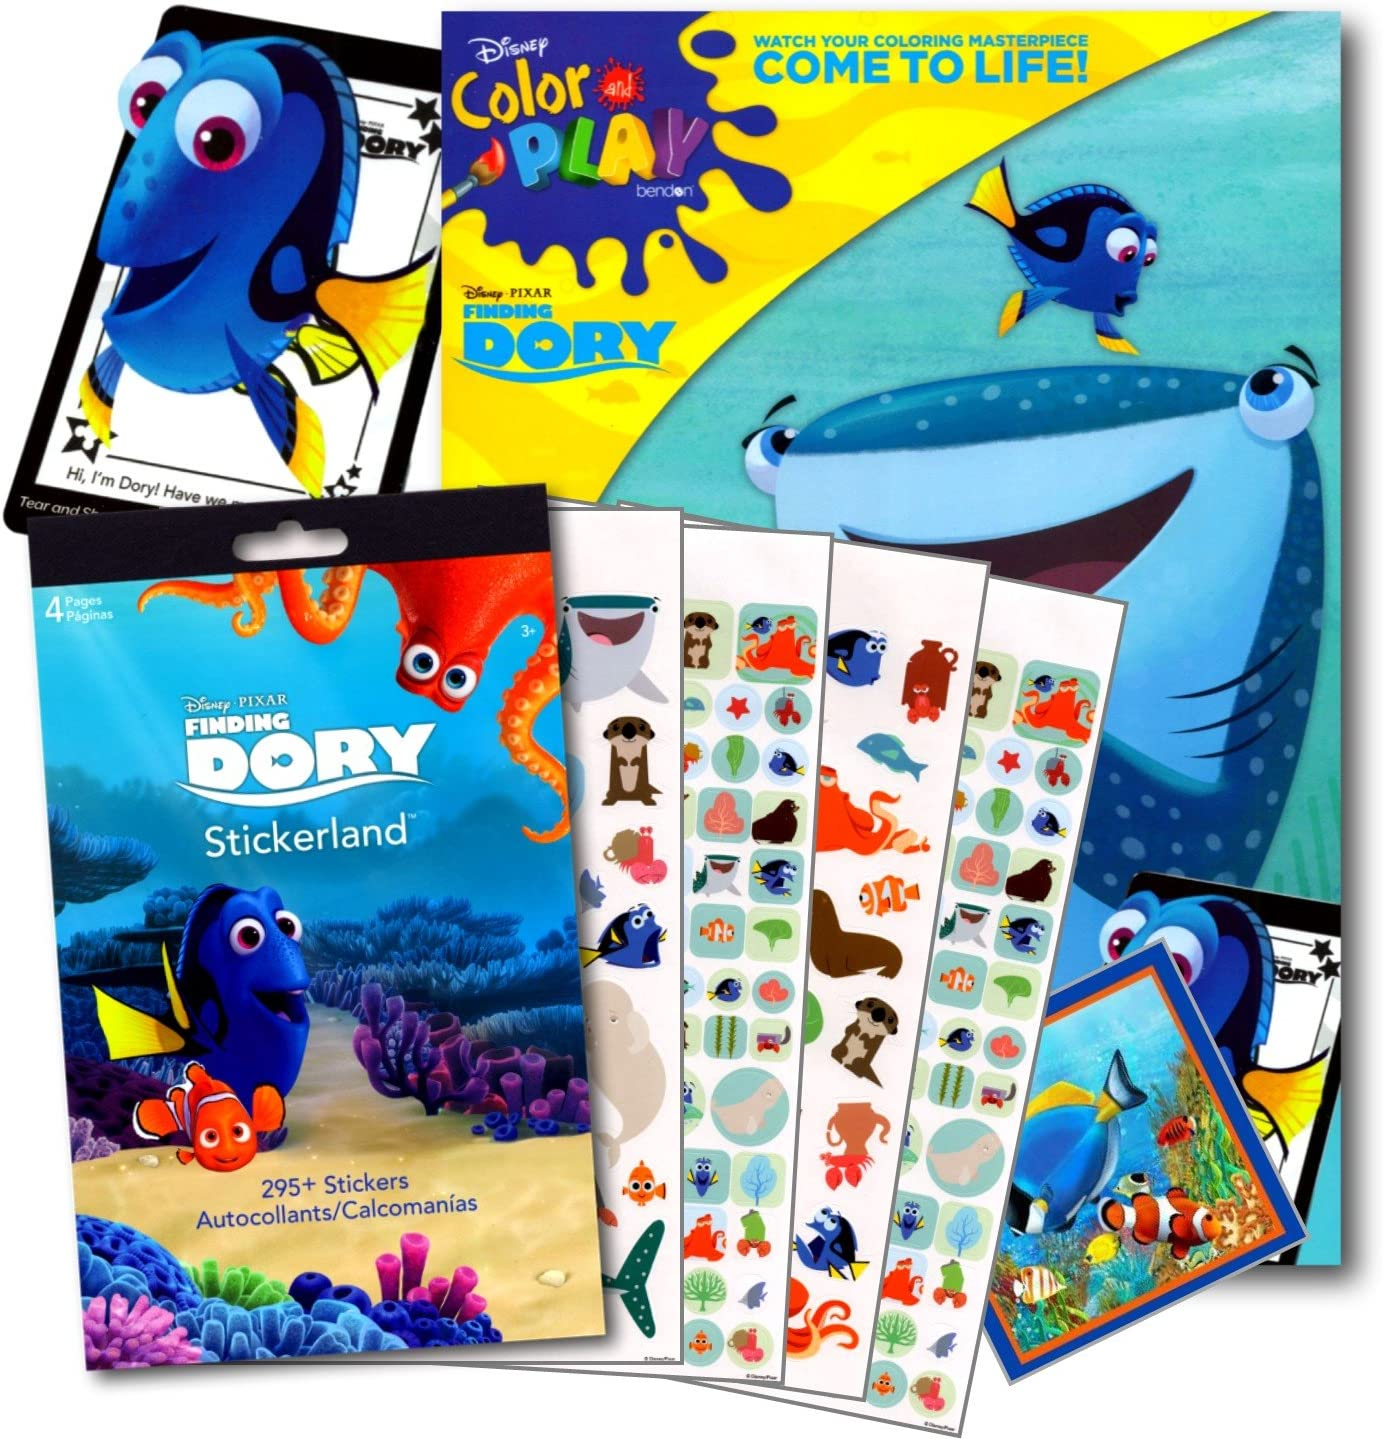 - Amazon.com: Disney Studios Finding Dory 96 Page Coloring Book Set